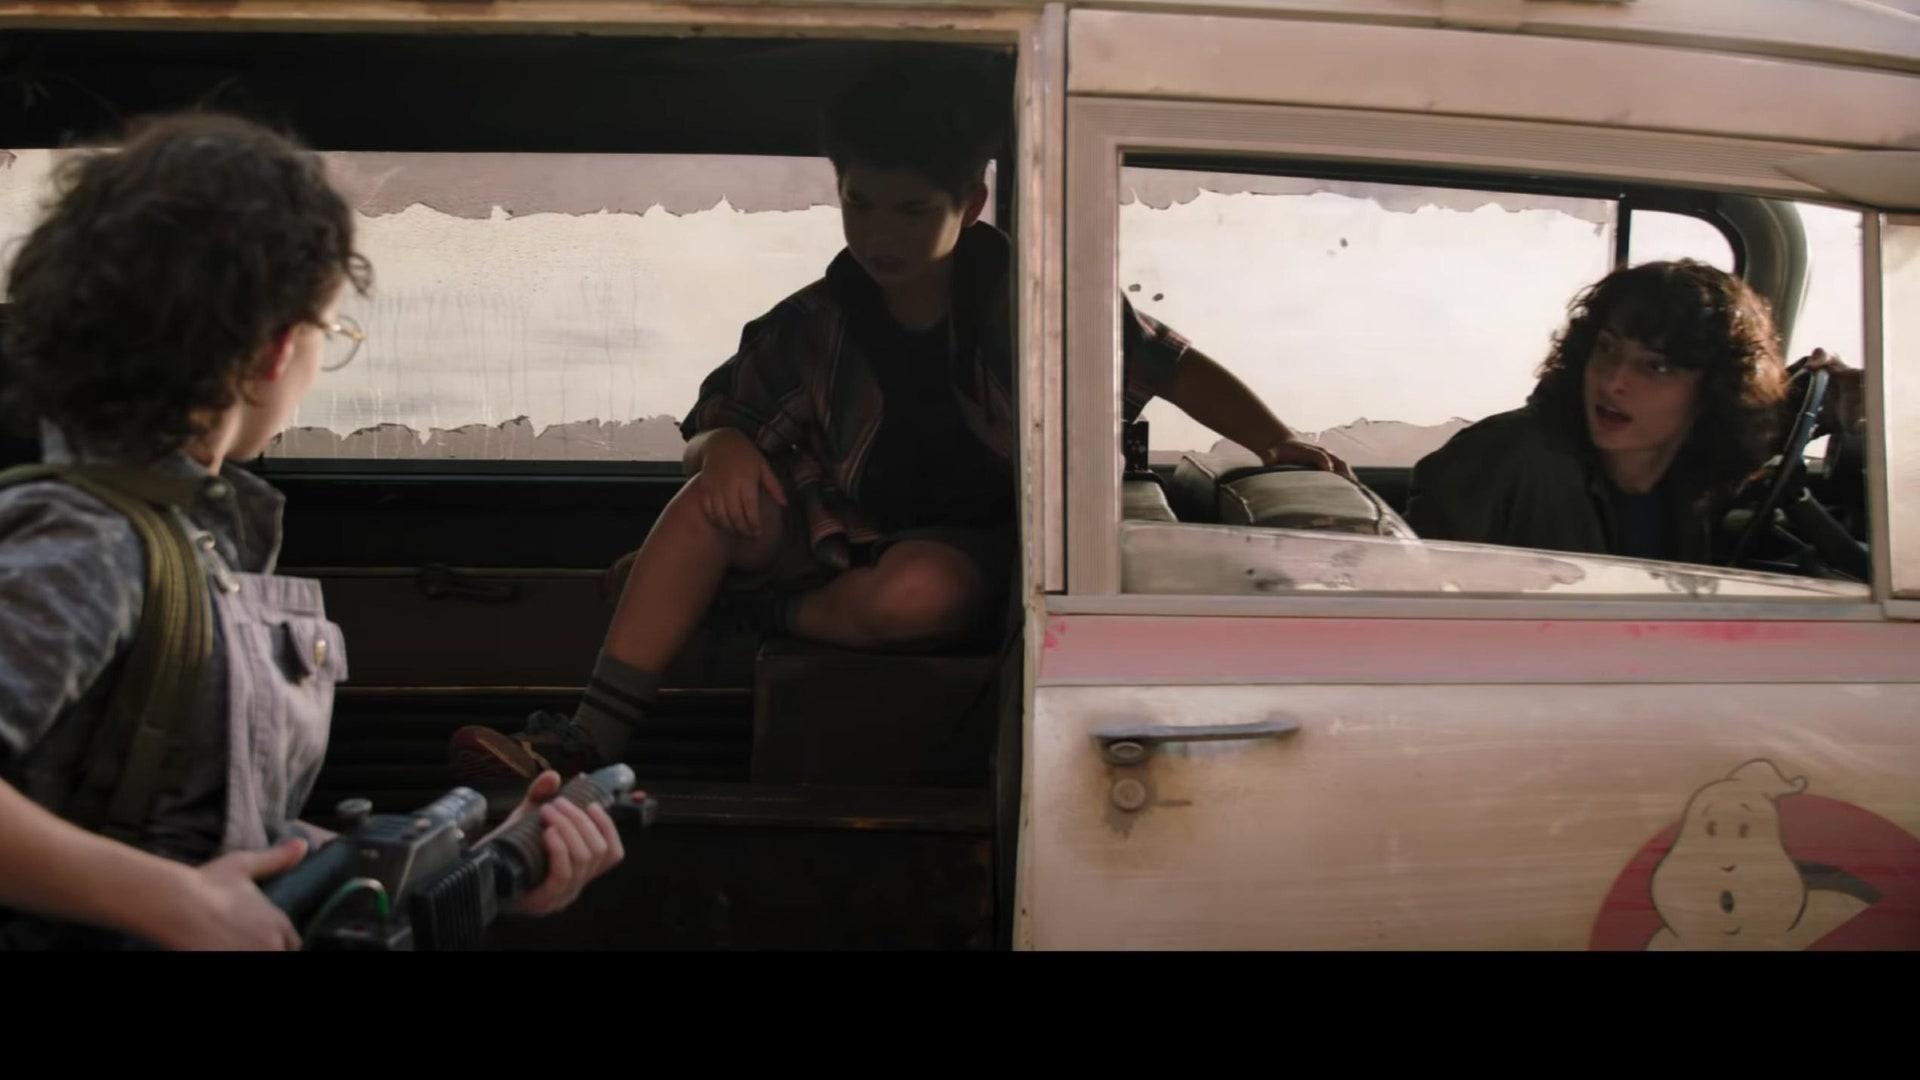 Sony Pictures revela una nueva imagen de Ghostbusters: Afterlife